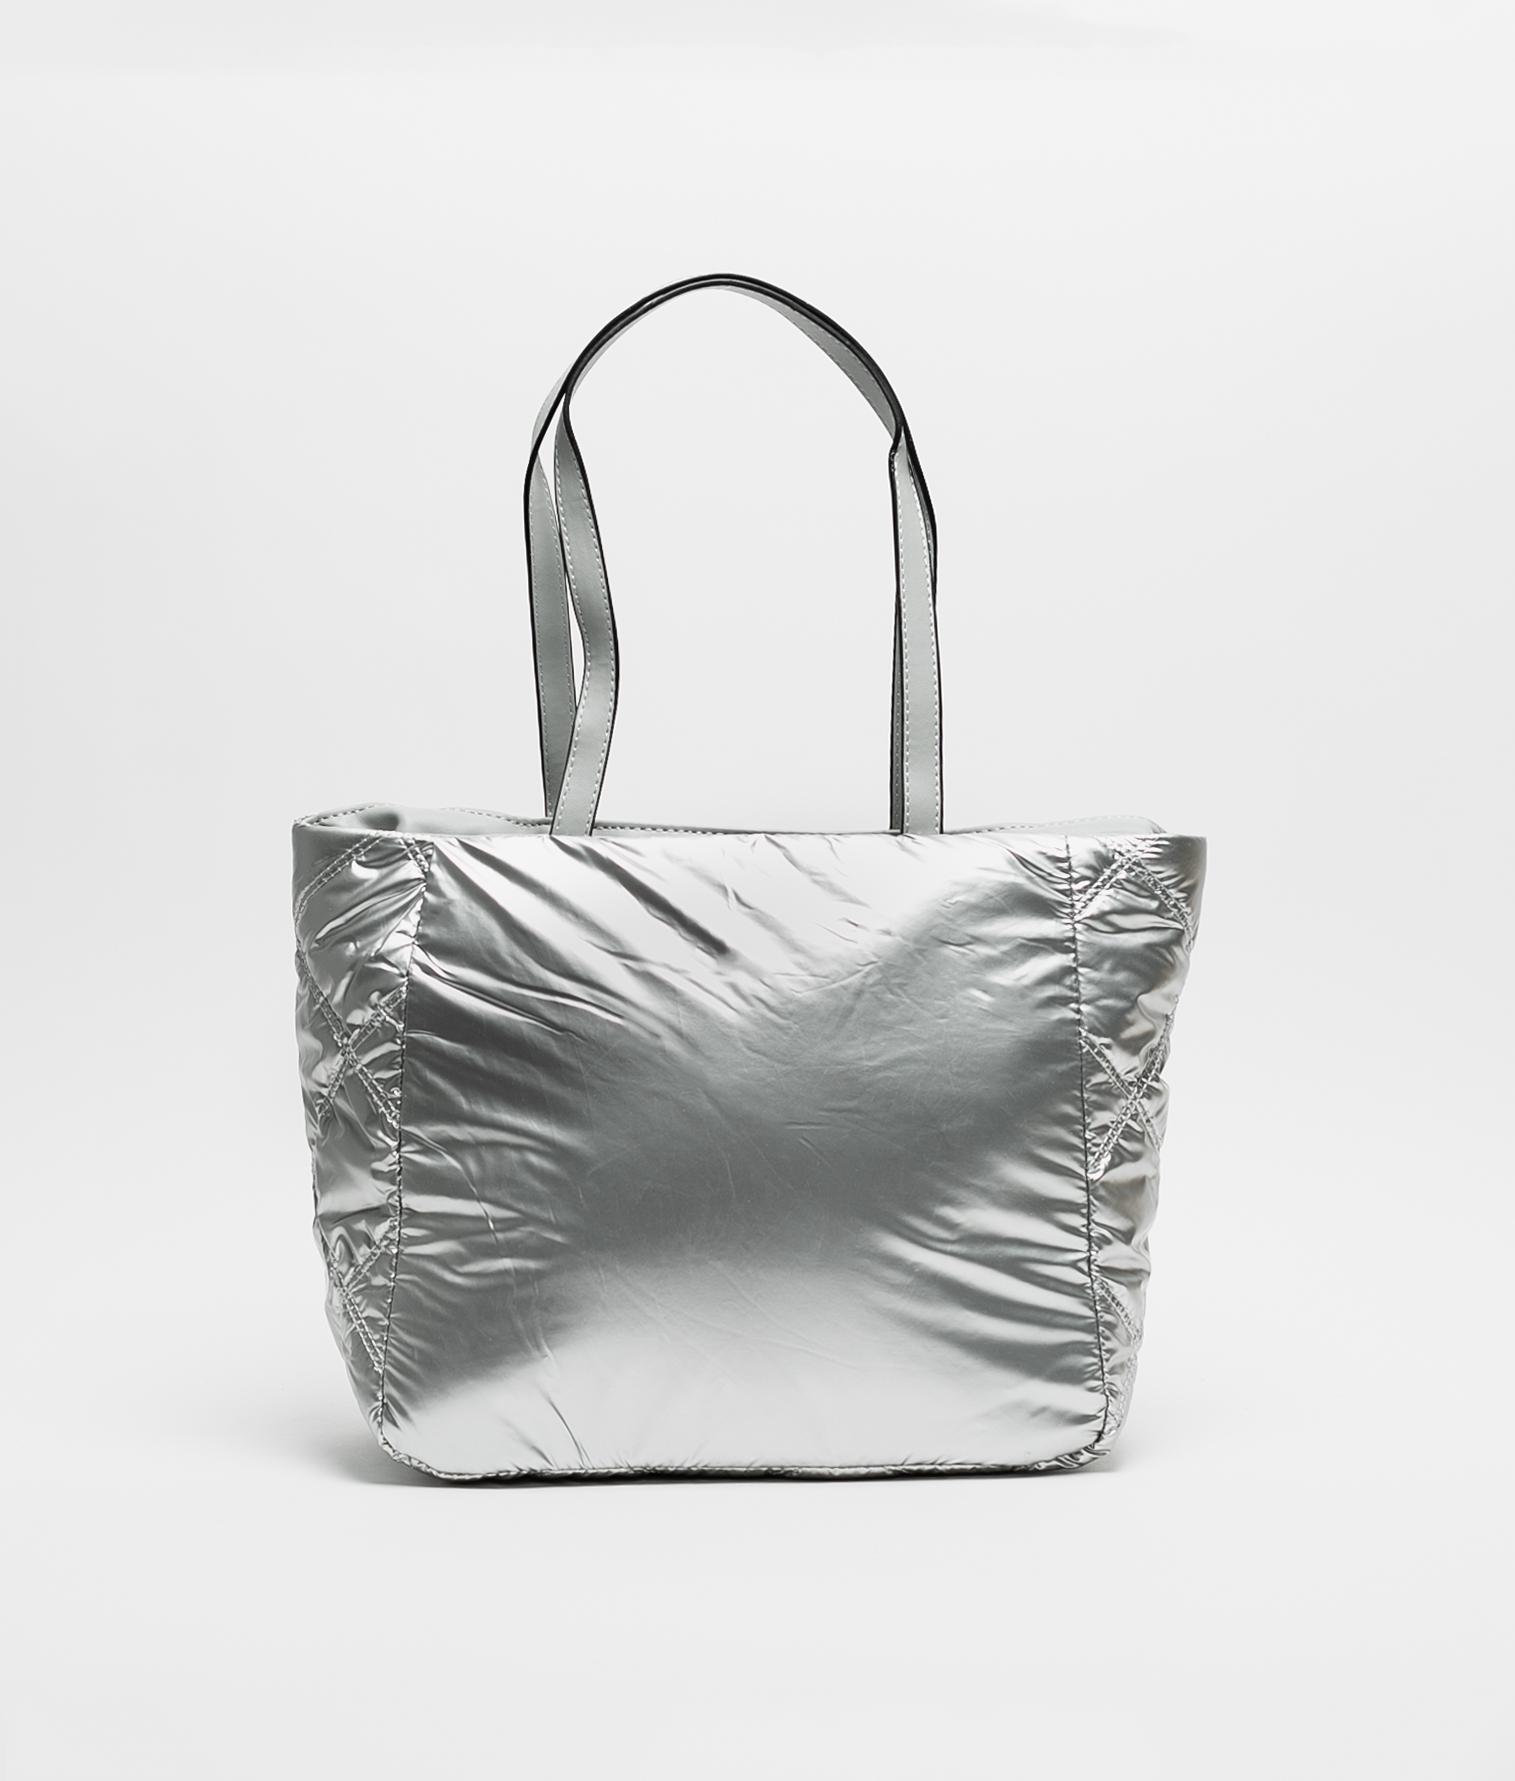 COLCY BAG - SILVER